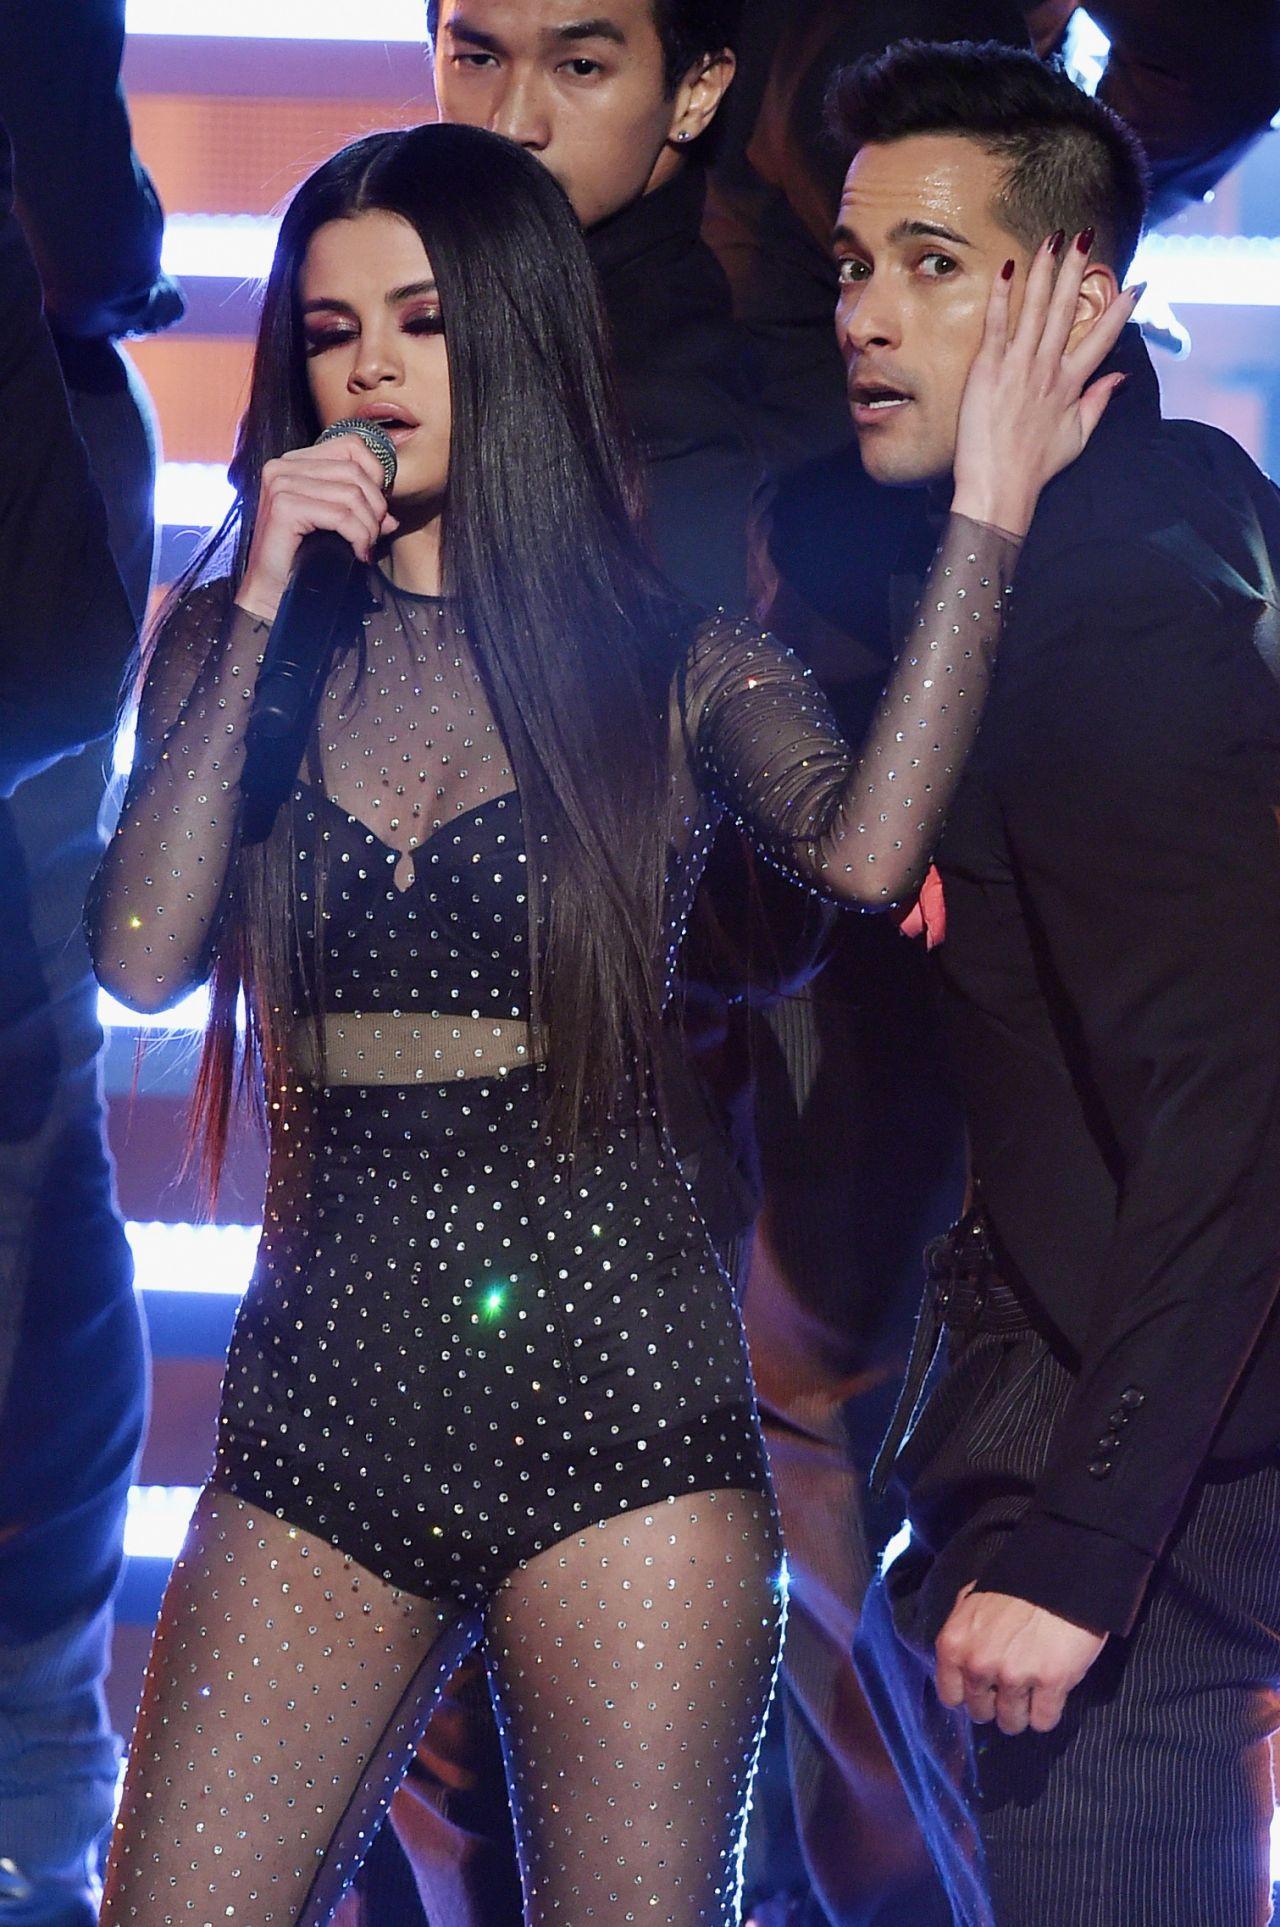 2015 Los Angeles Film Festival: Selena Gomez Performs At 2015 American Music Awards In Los